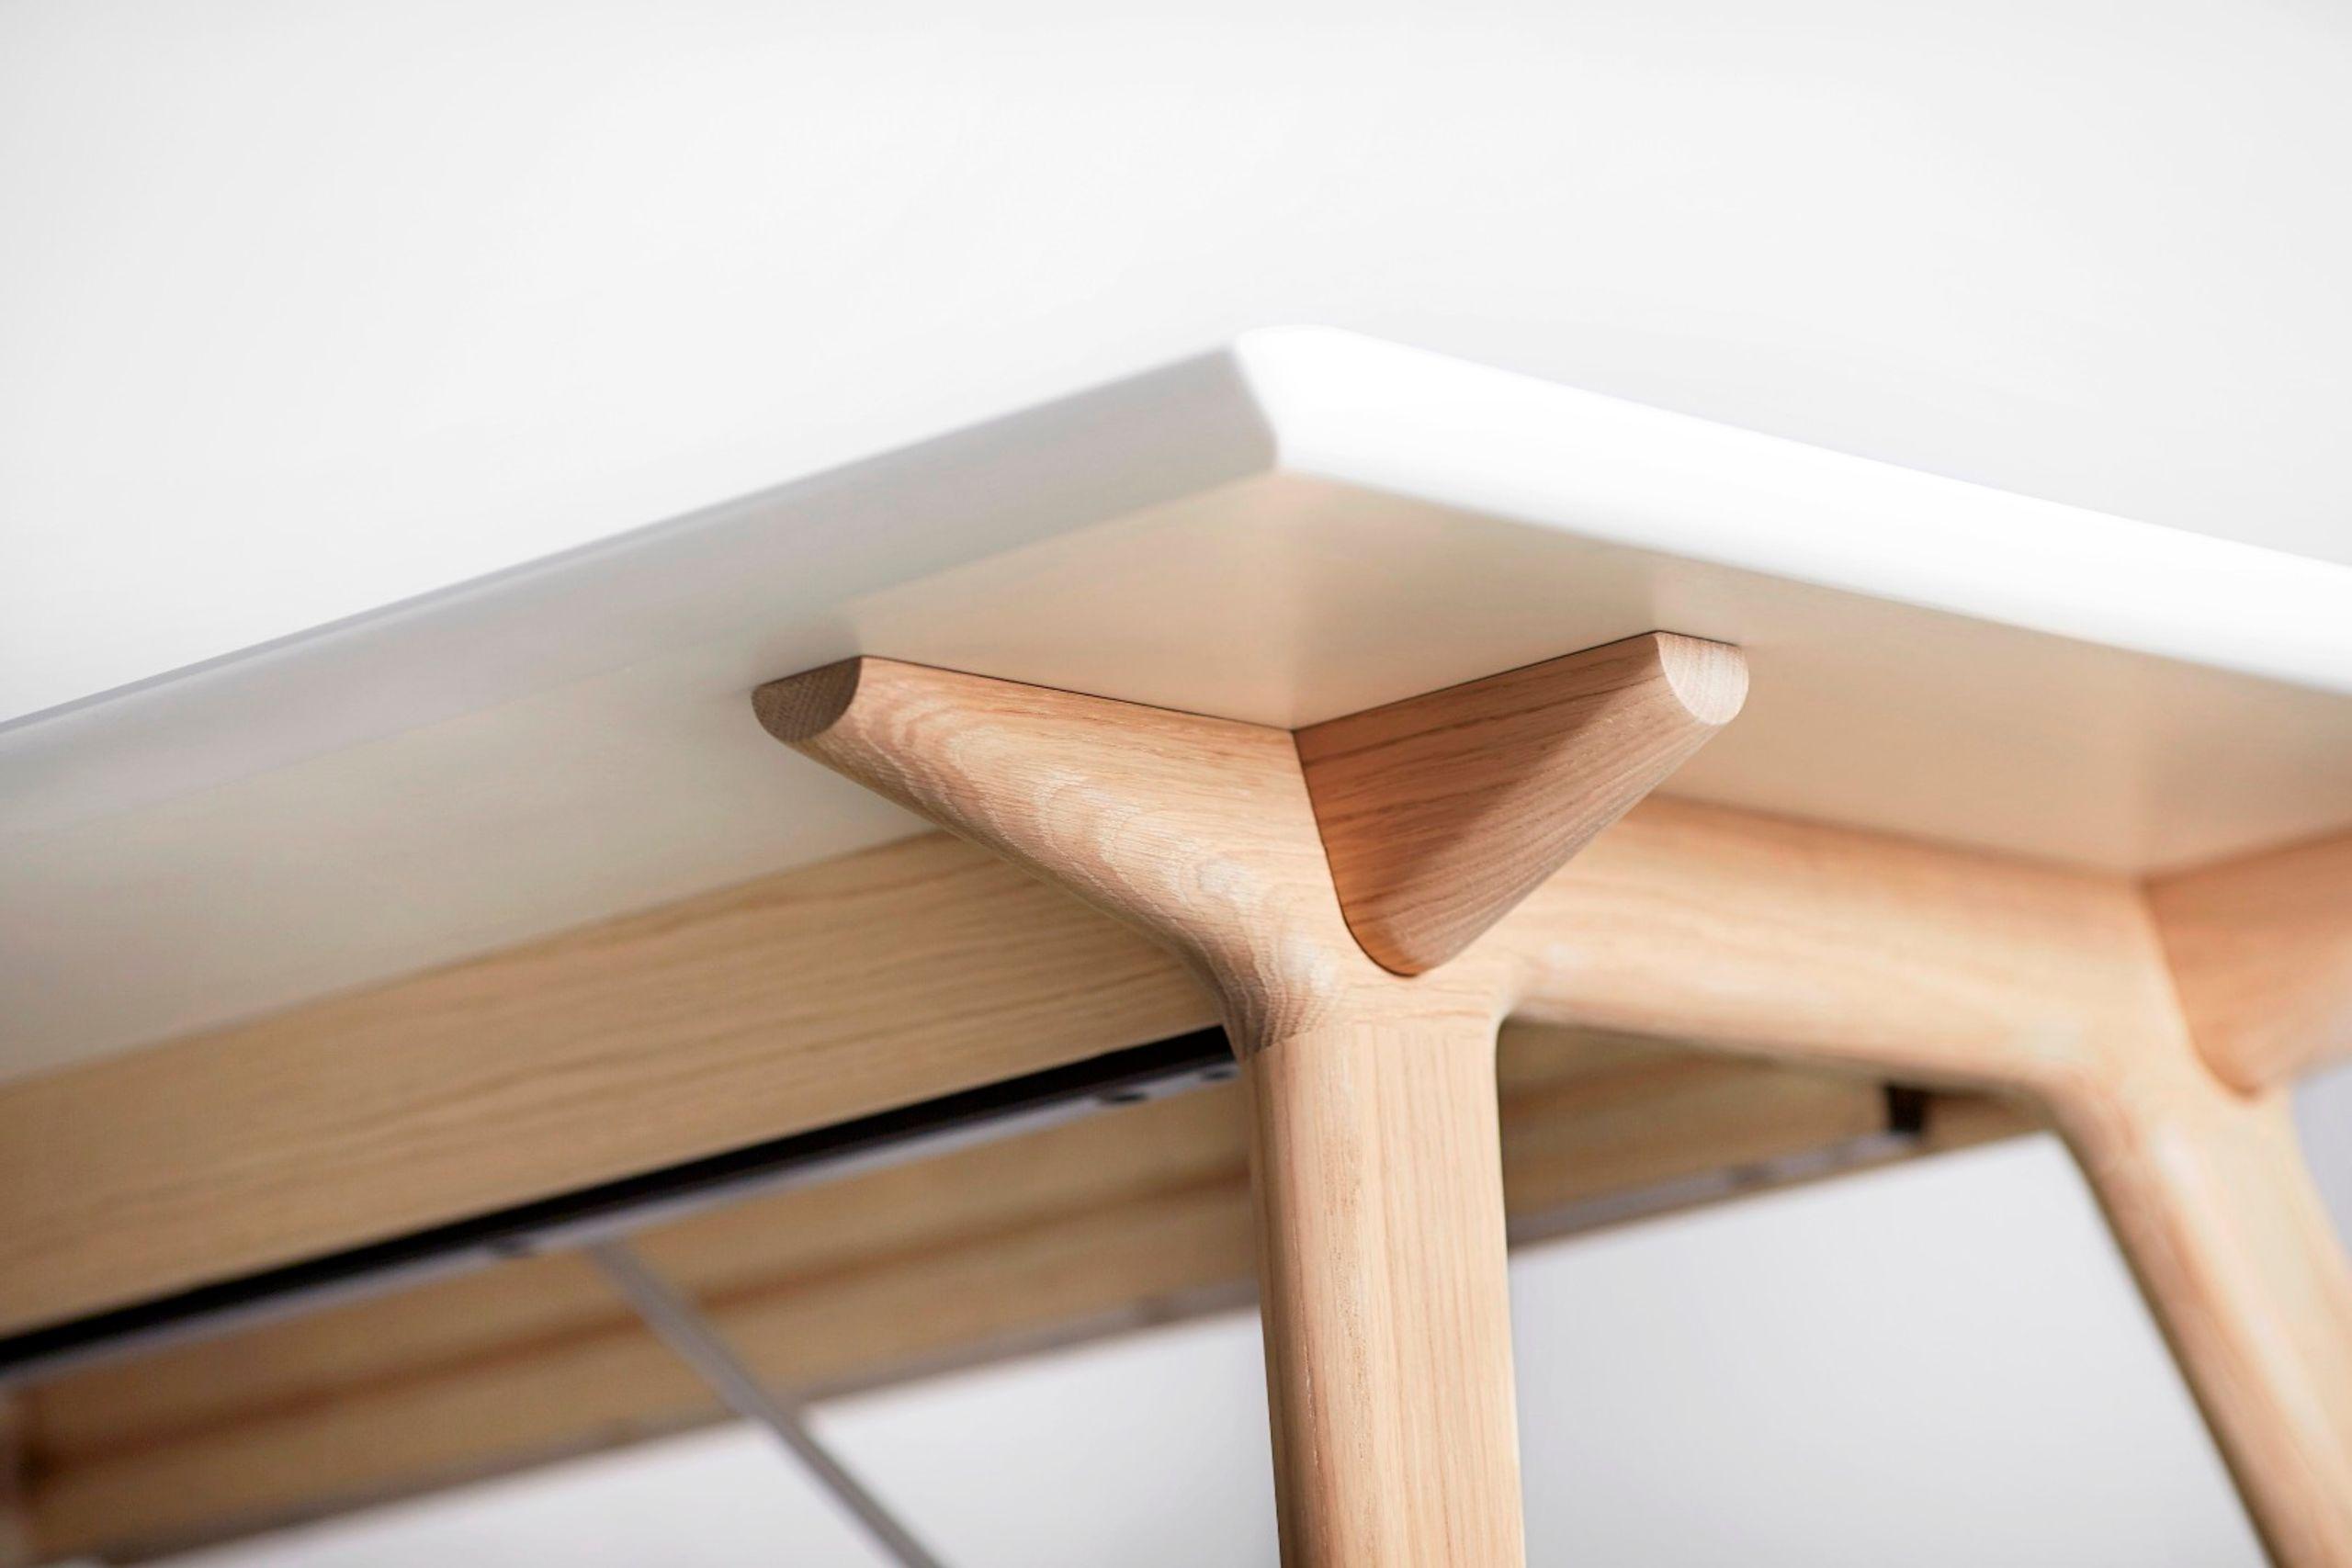 ... Andersen Furniture   Dining Table   Temp   Andersen T7 Spisebord   Hvid  Laminat   Egestel ...